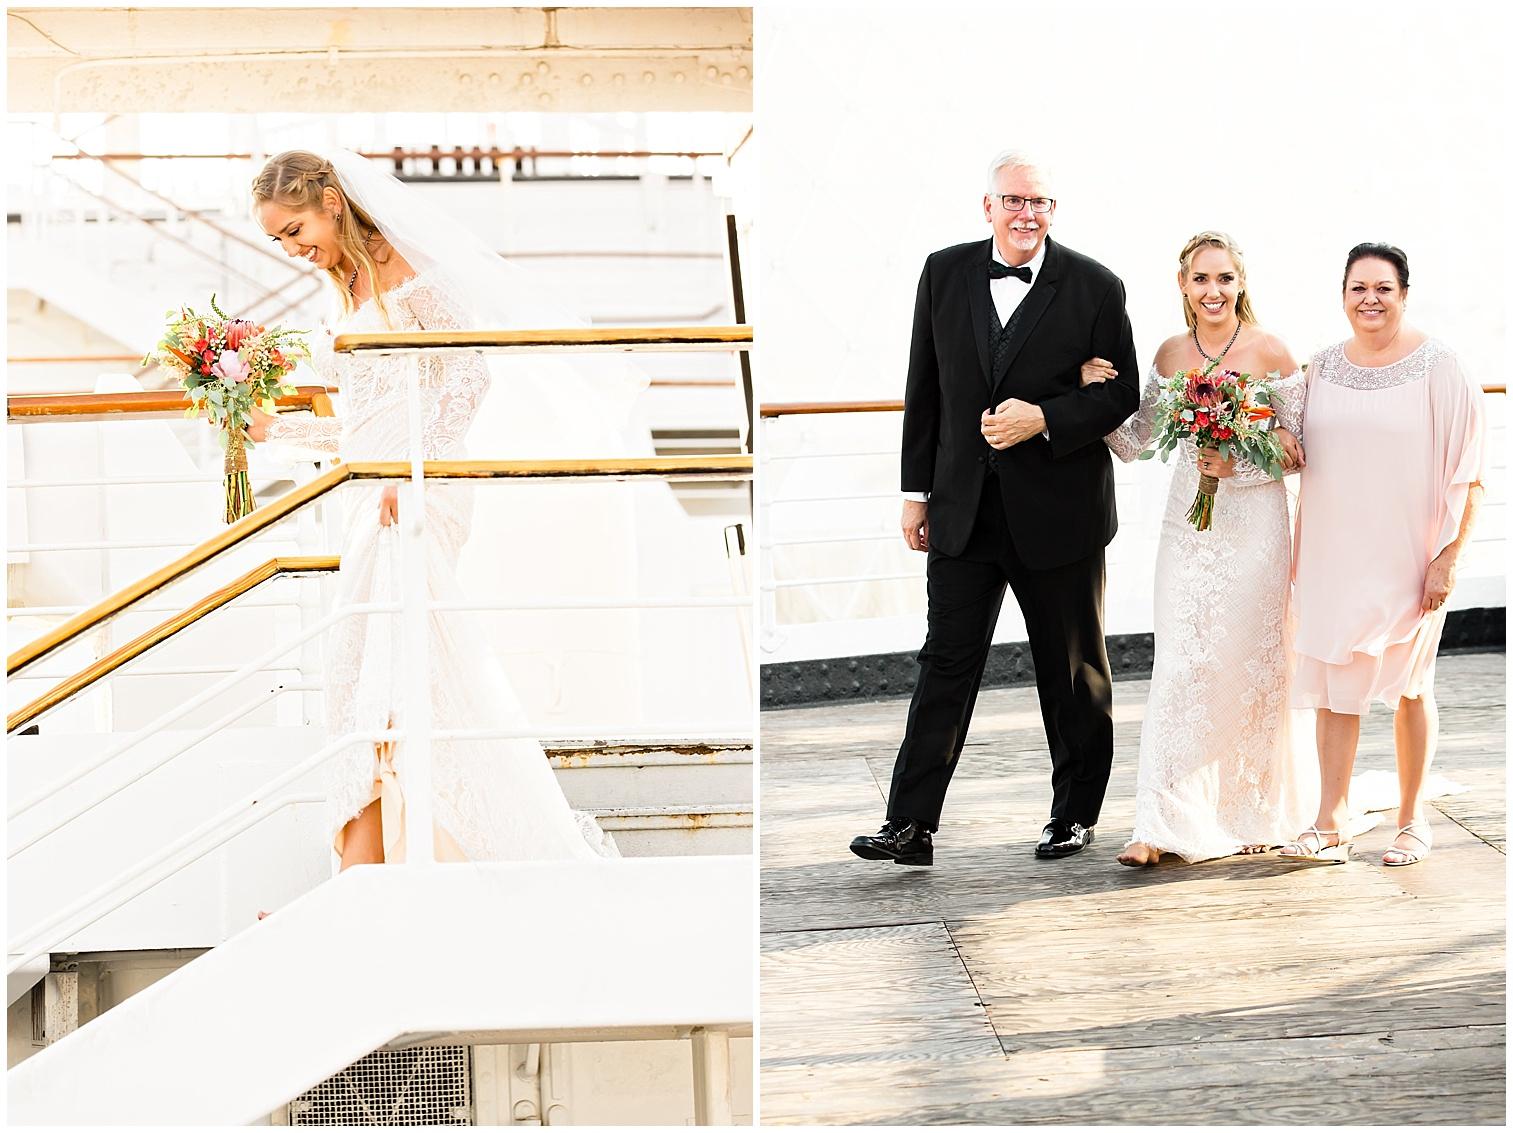 Queen_Mary_Long_Beach_Wedding_Photography_0460.jpg